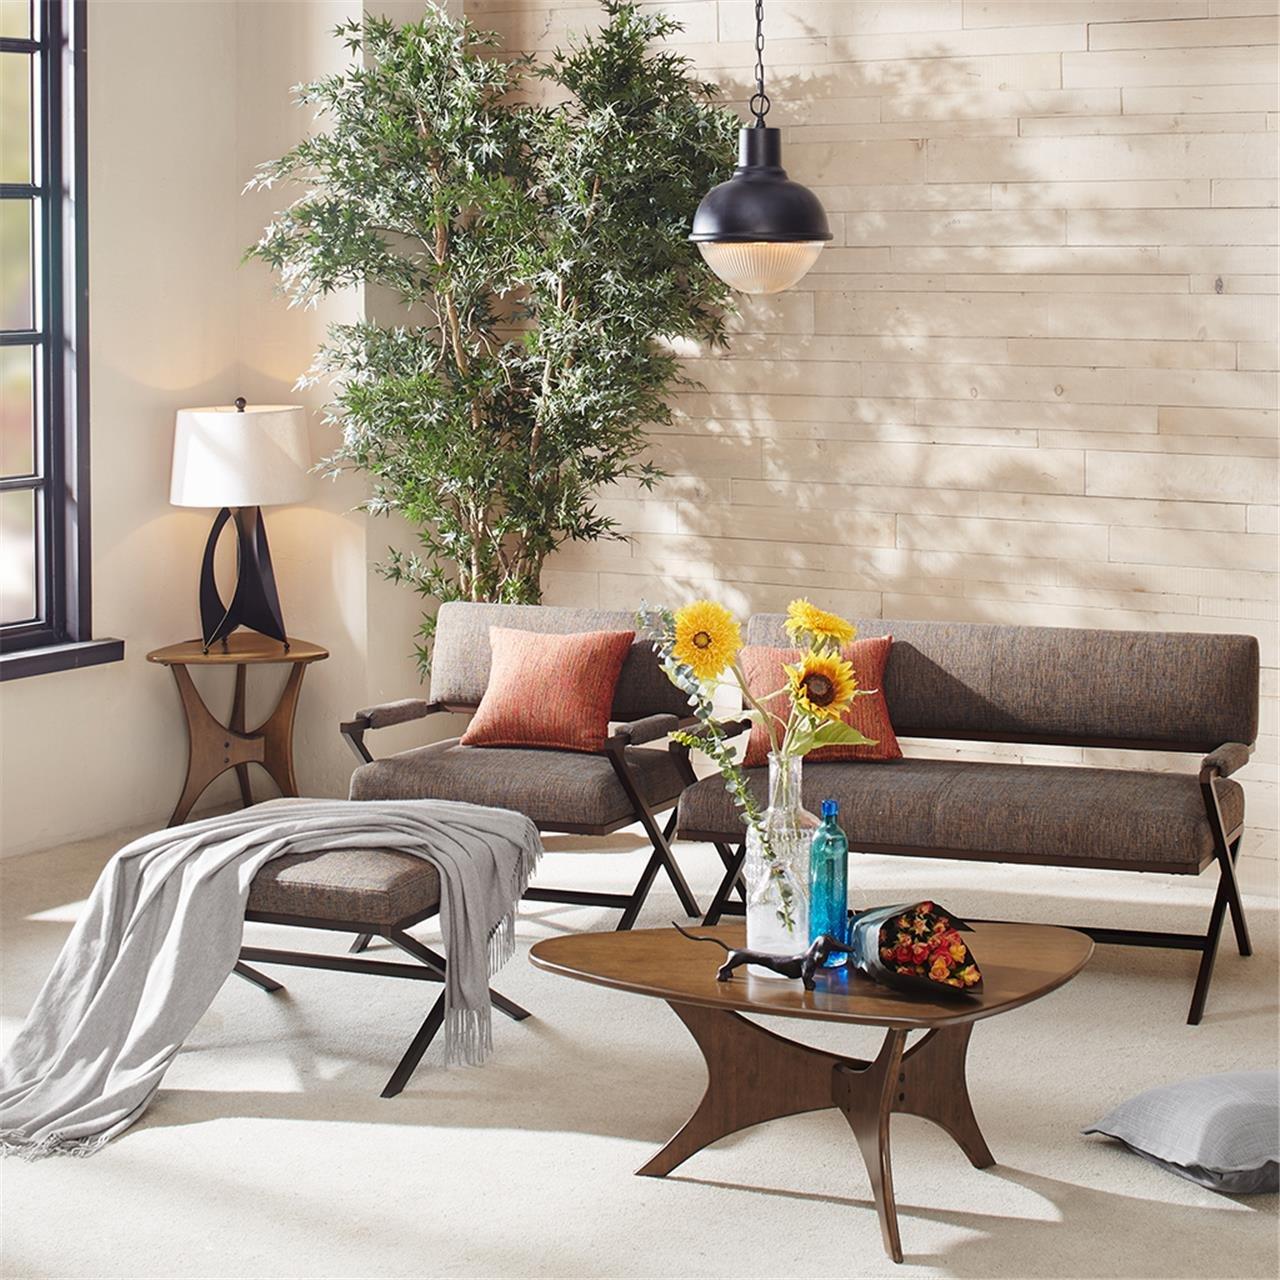 Modern Design Of Wooden Home Furniture -  - home-decor - 814zXarR2mL. SL1280  -